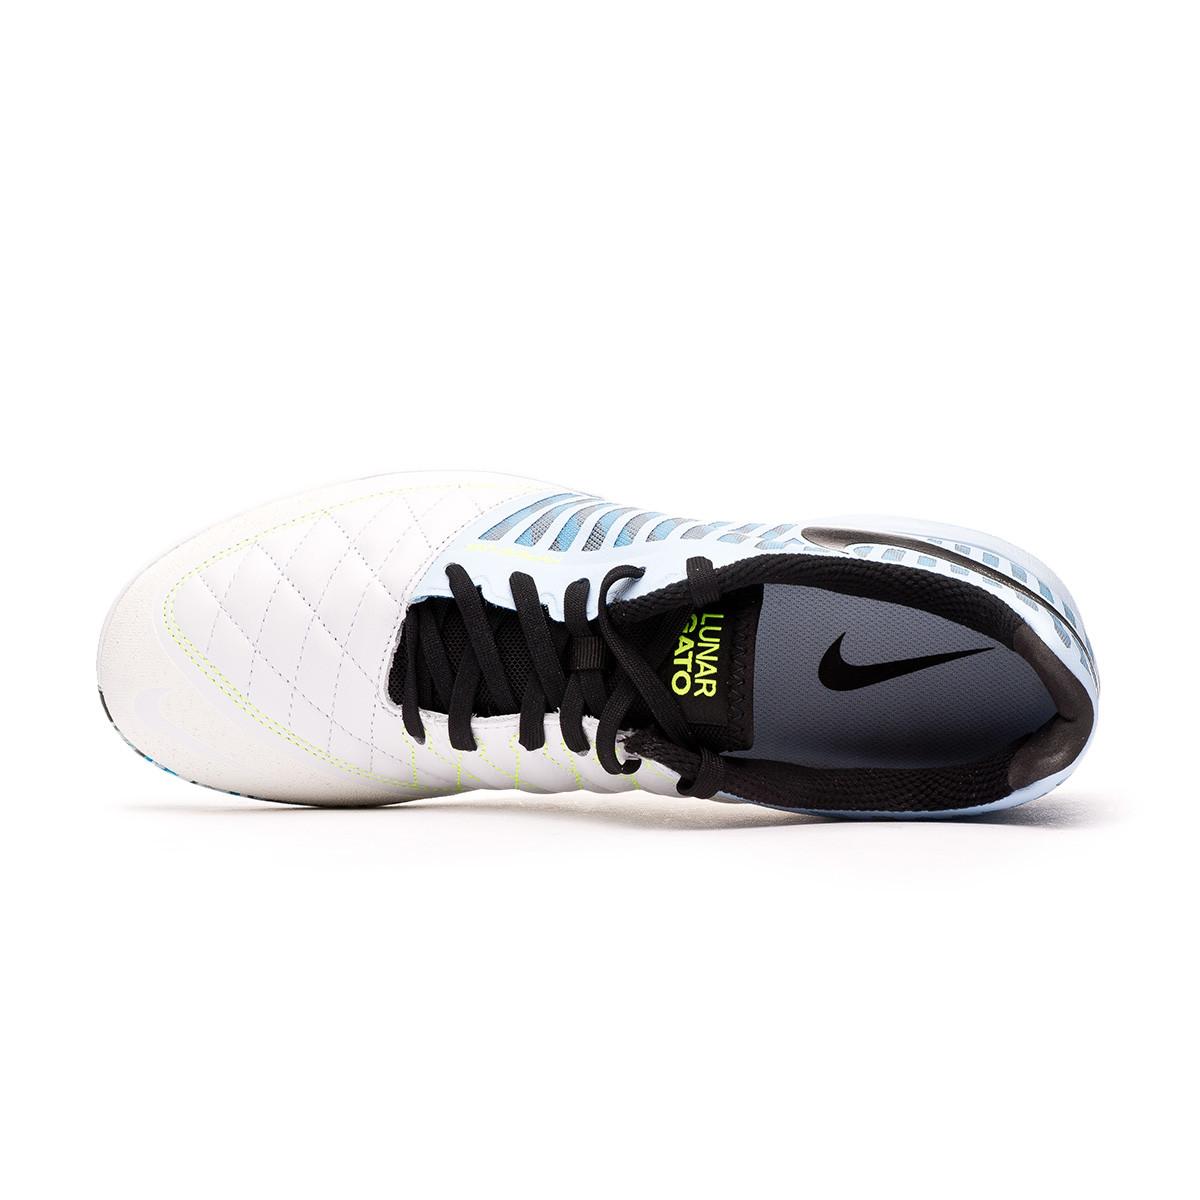 Enorme policía Odio  Tenis Nike Lunar Gato II Celestine blue-Black-Laser blue-Volt-Iron gre -  Tienda de fútbol Fútbol Emotion